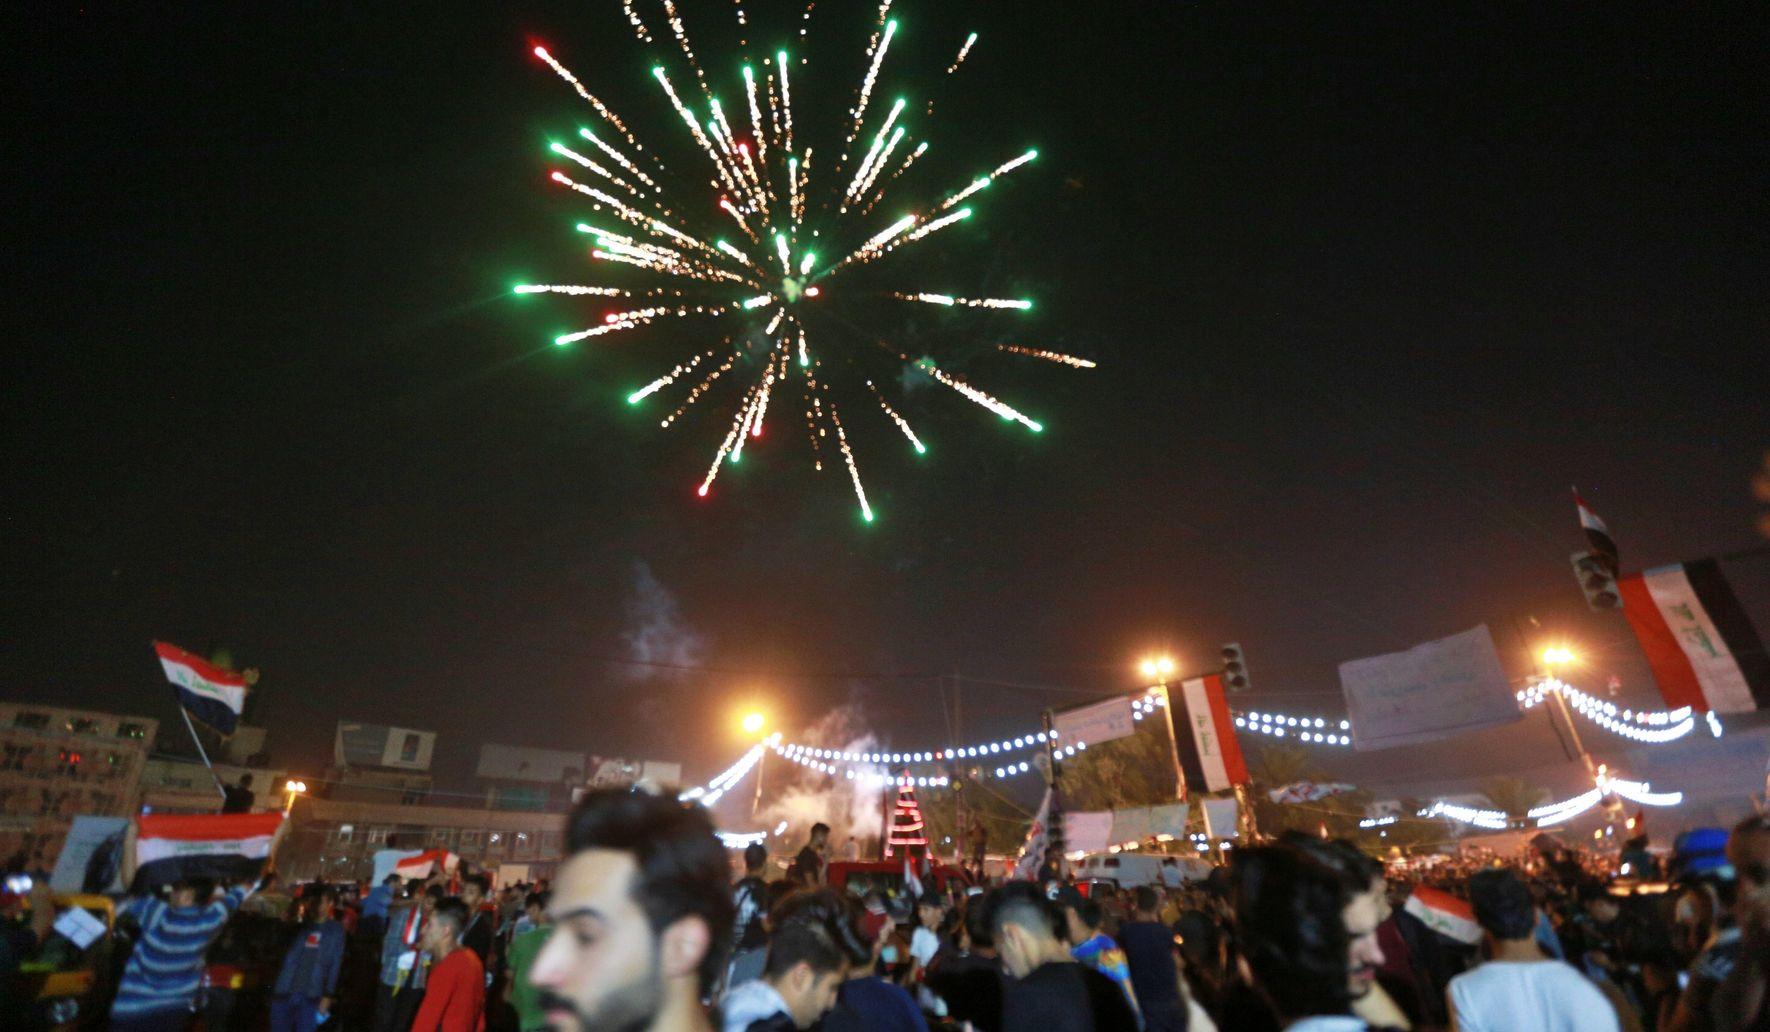 Iraq_protests_86395_c0-241-5760-3599_s1770x1032